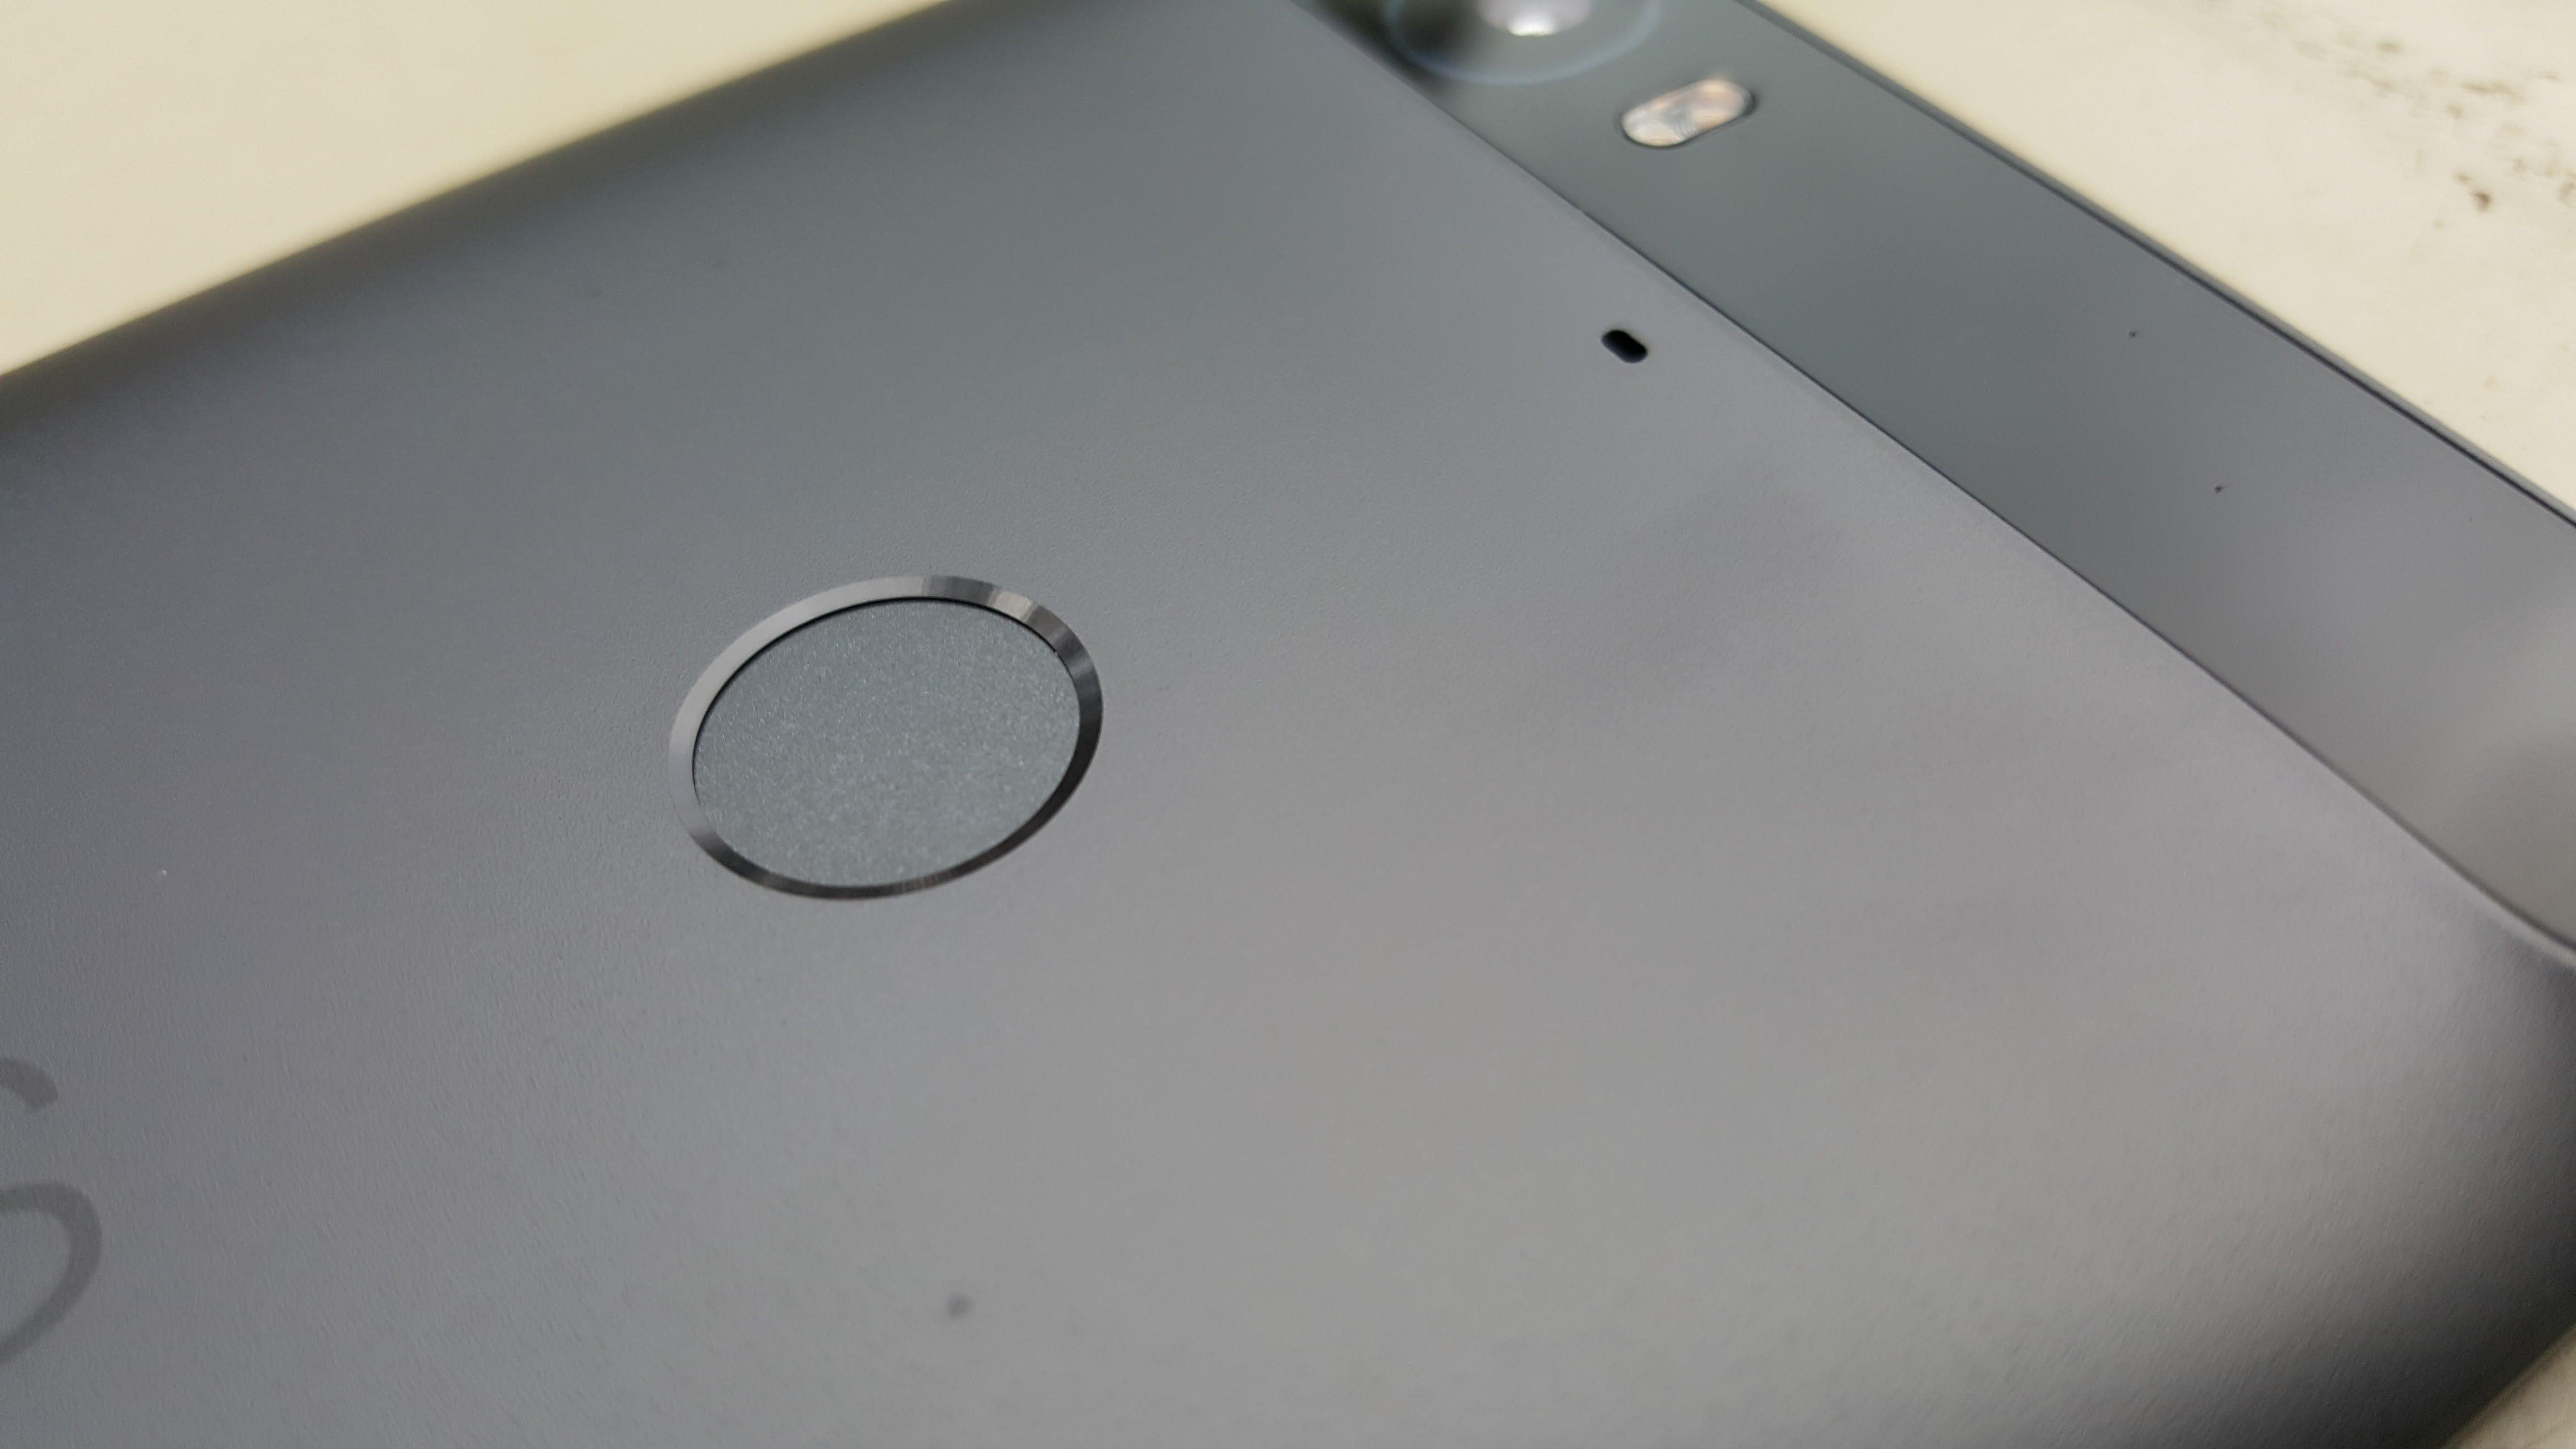 Nexus 6P fingerprint reader.